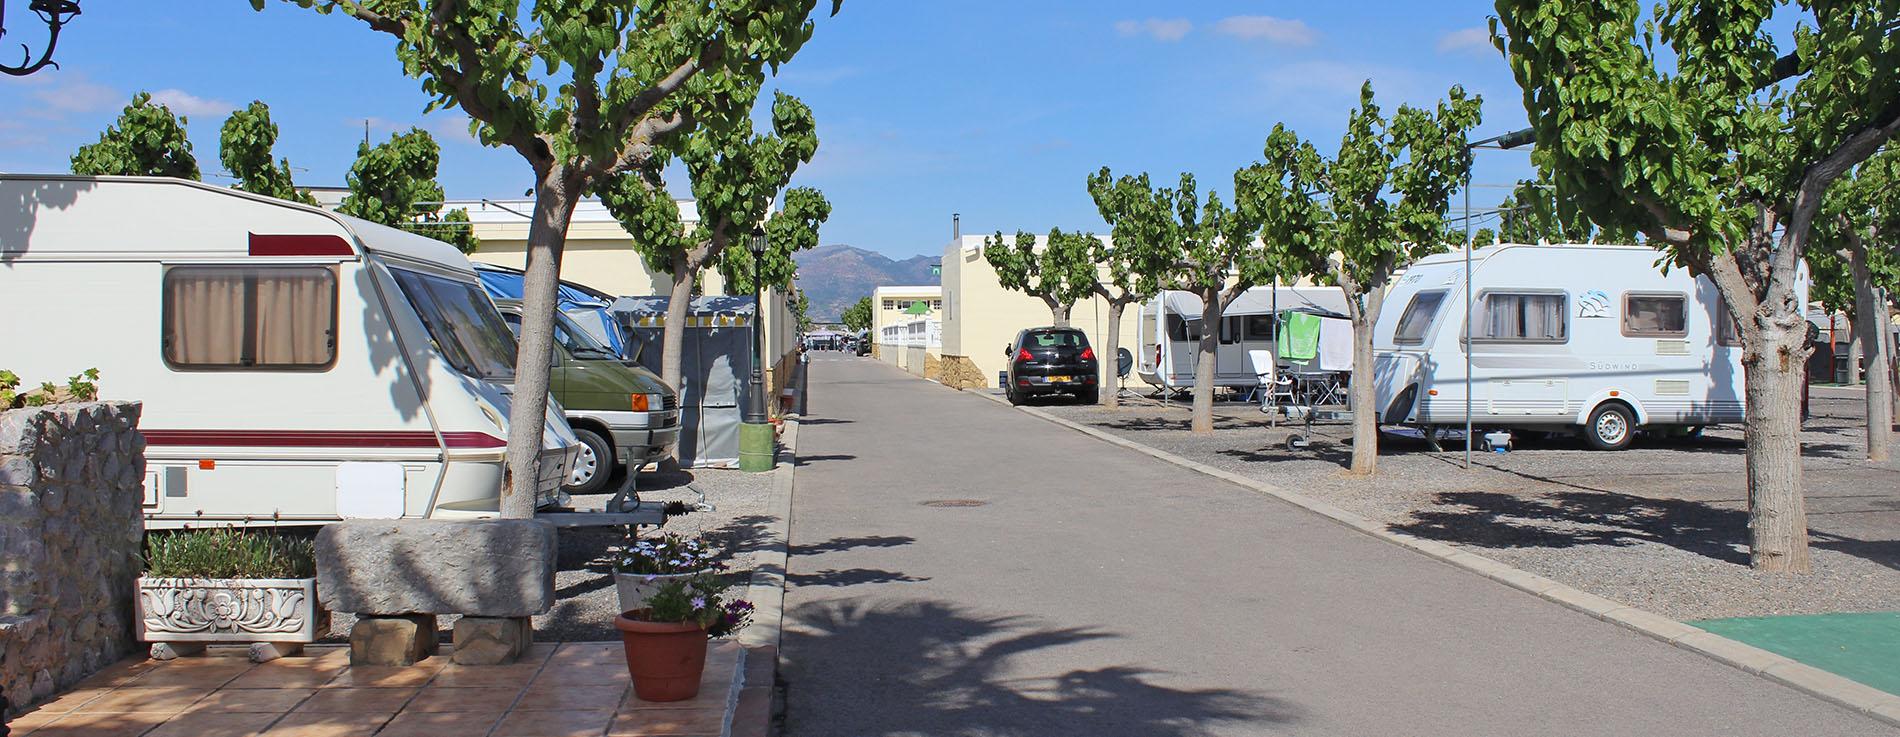 calles amplias y espaciosas para plazas de caravana en castellon